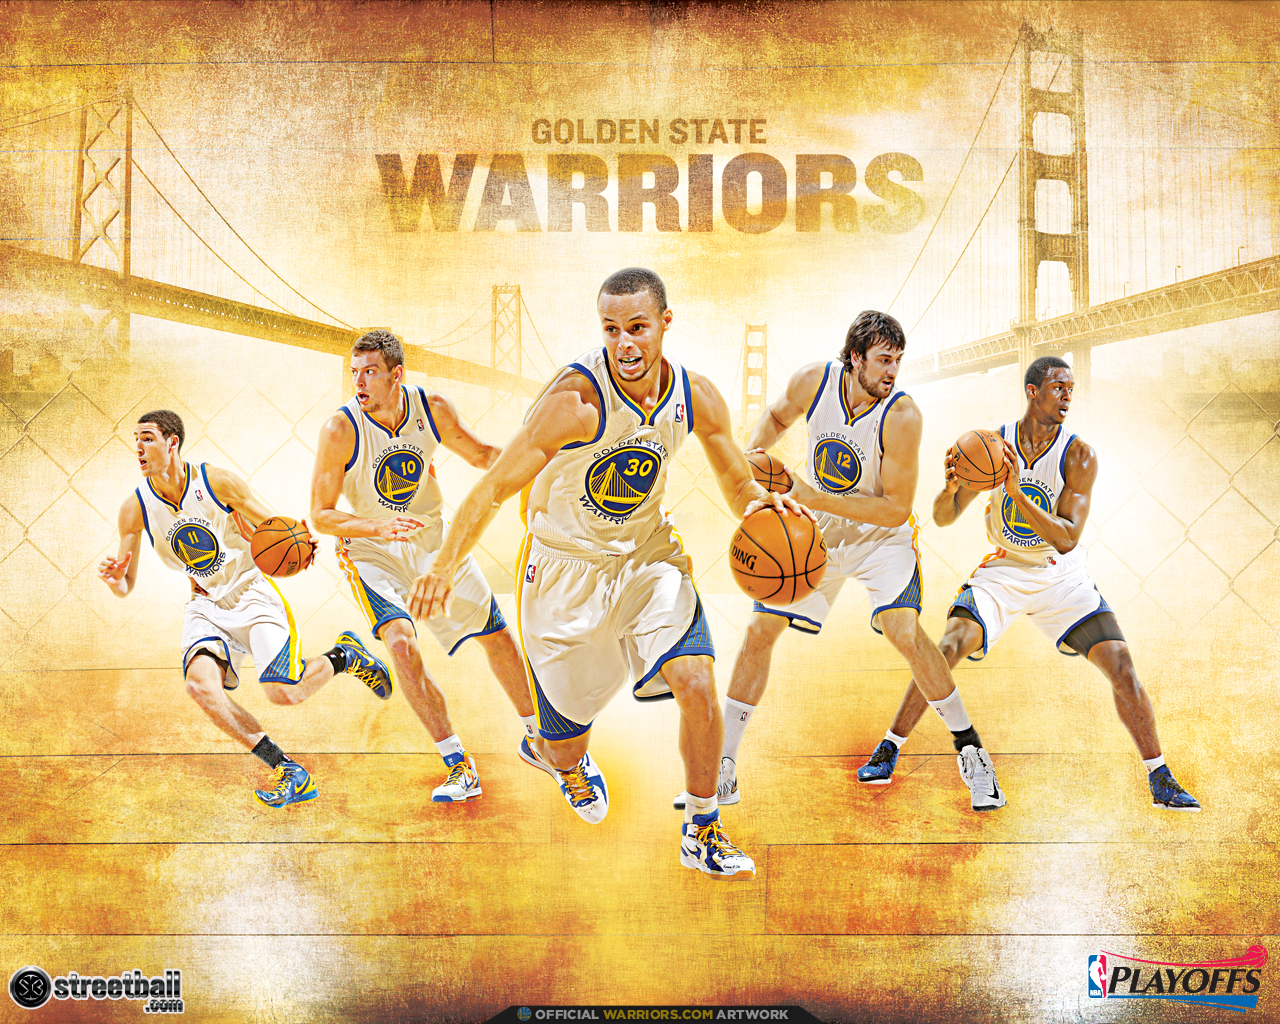 Golden State Warriors Team Wallpapers Top Free Golden State Warriors Team Backgrounds Wallpaperaccess